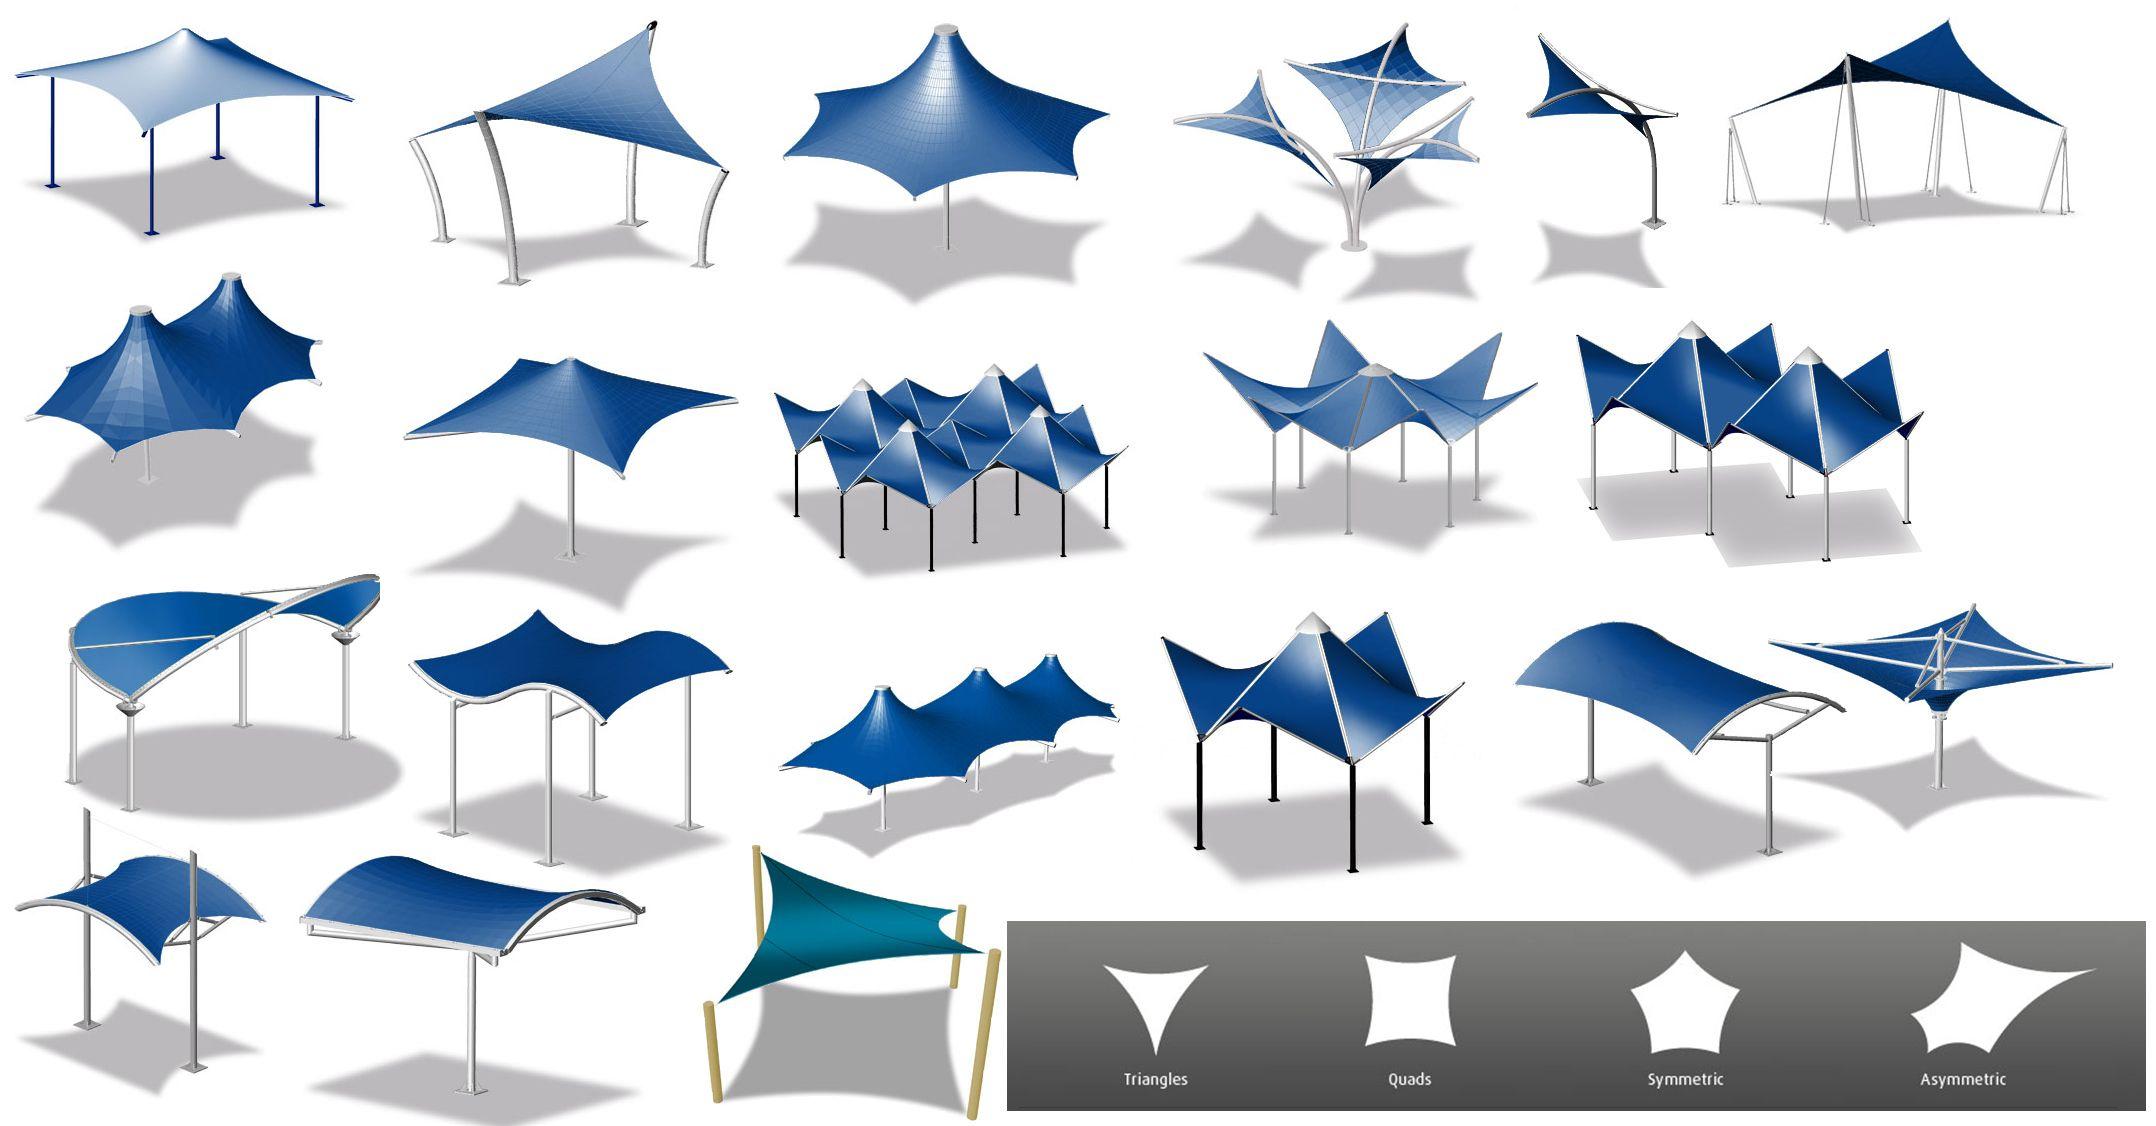 Pin De Prim Nicha En Tensile Canopy Architecture